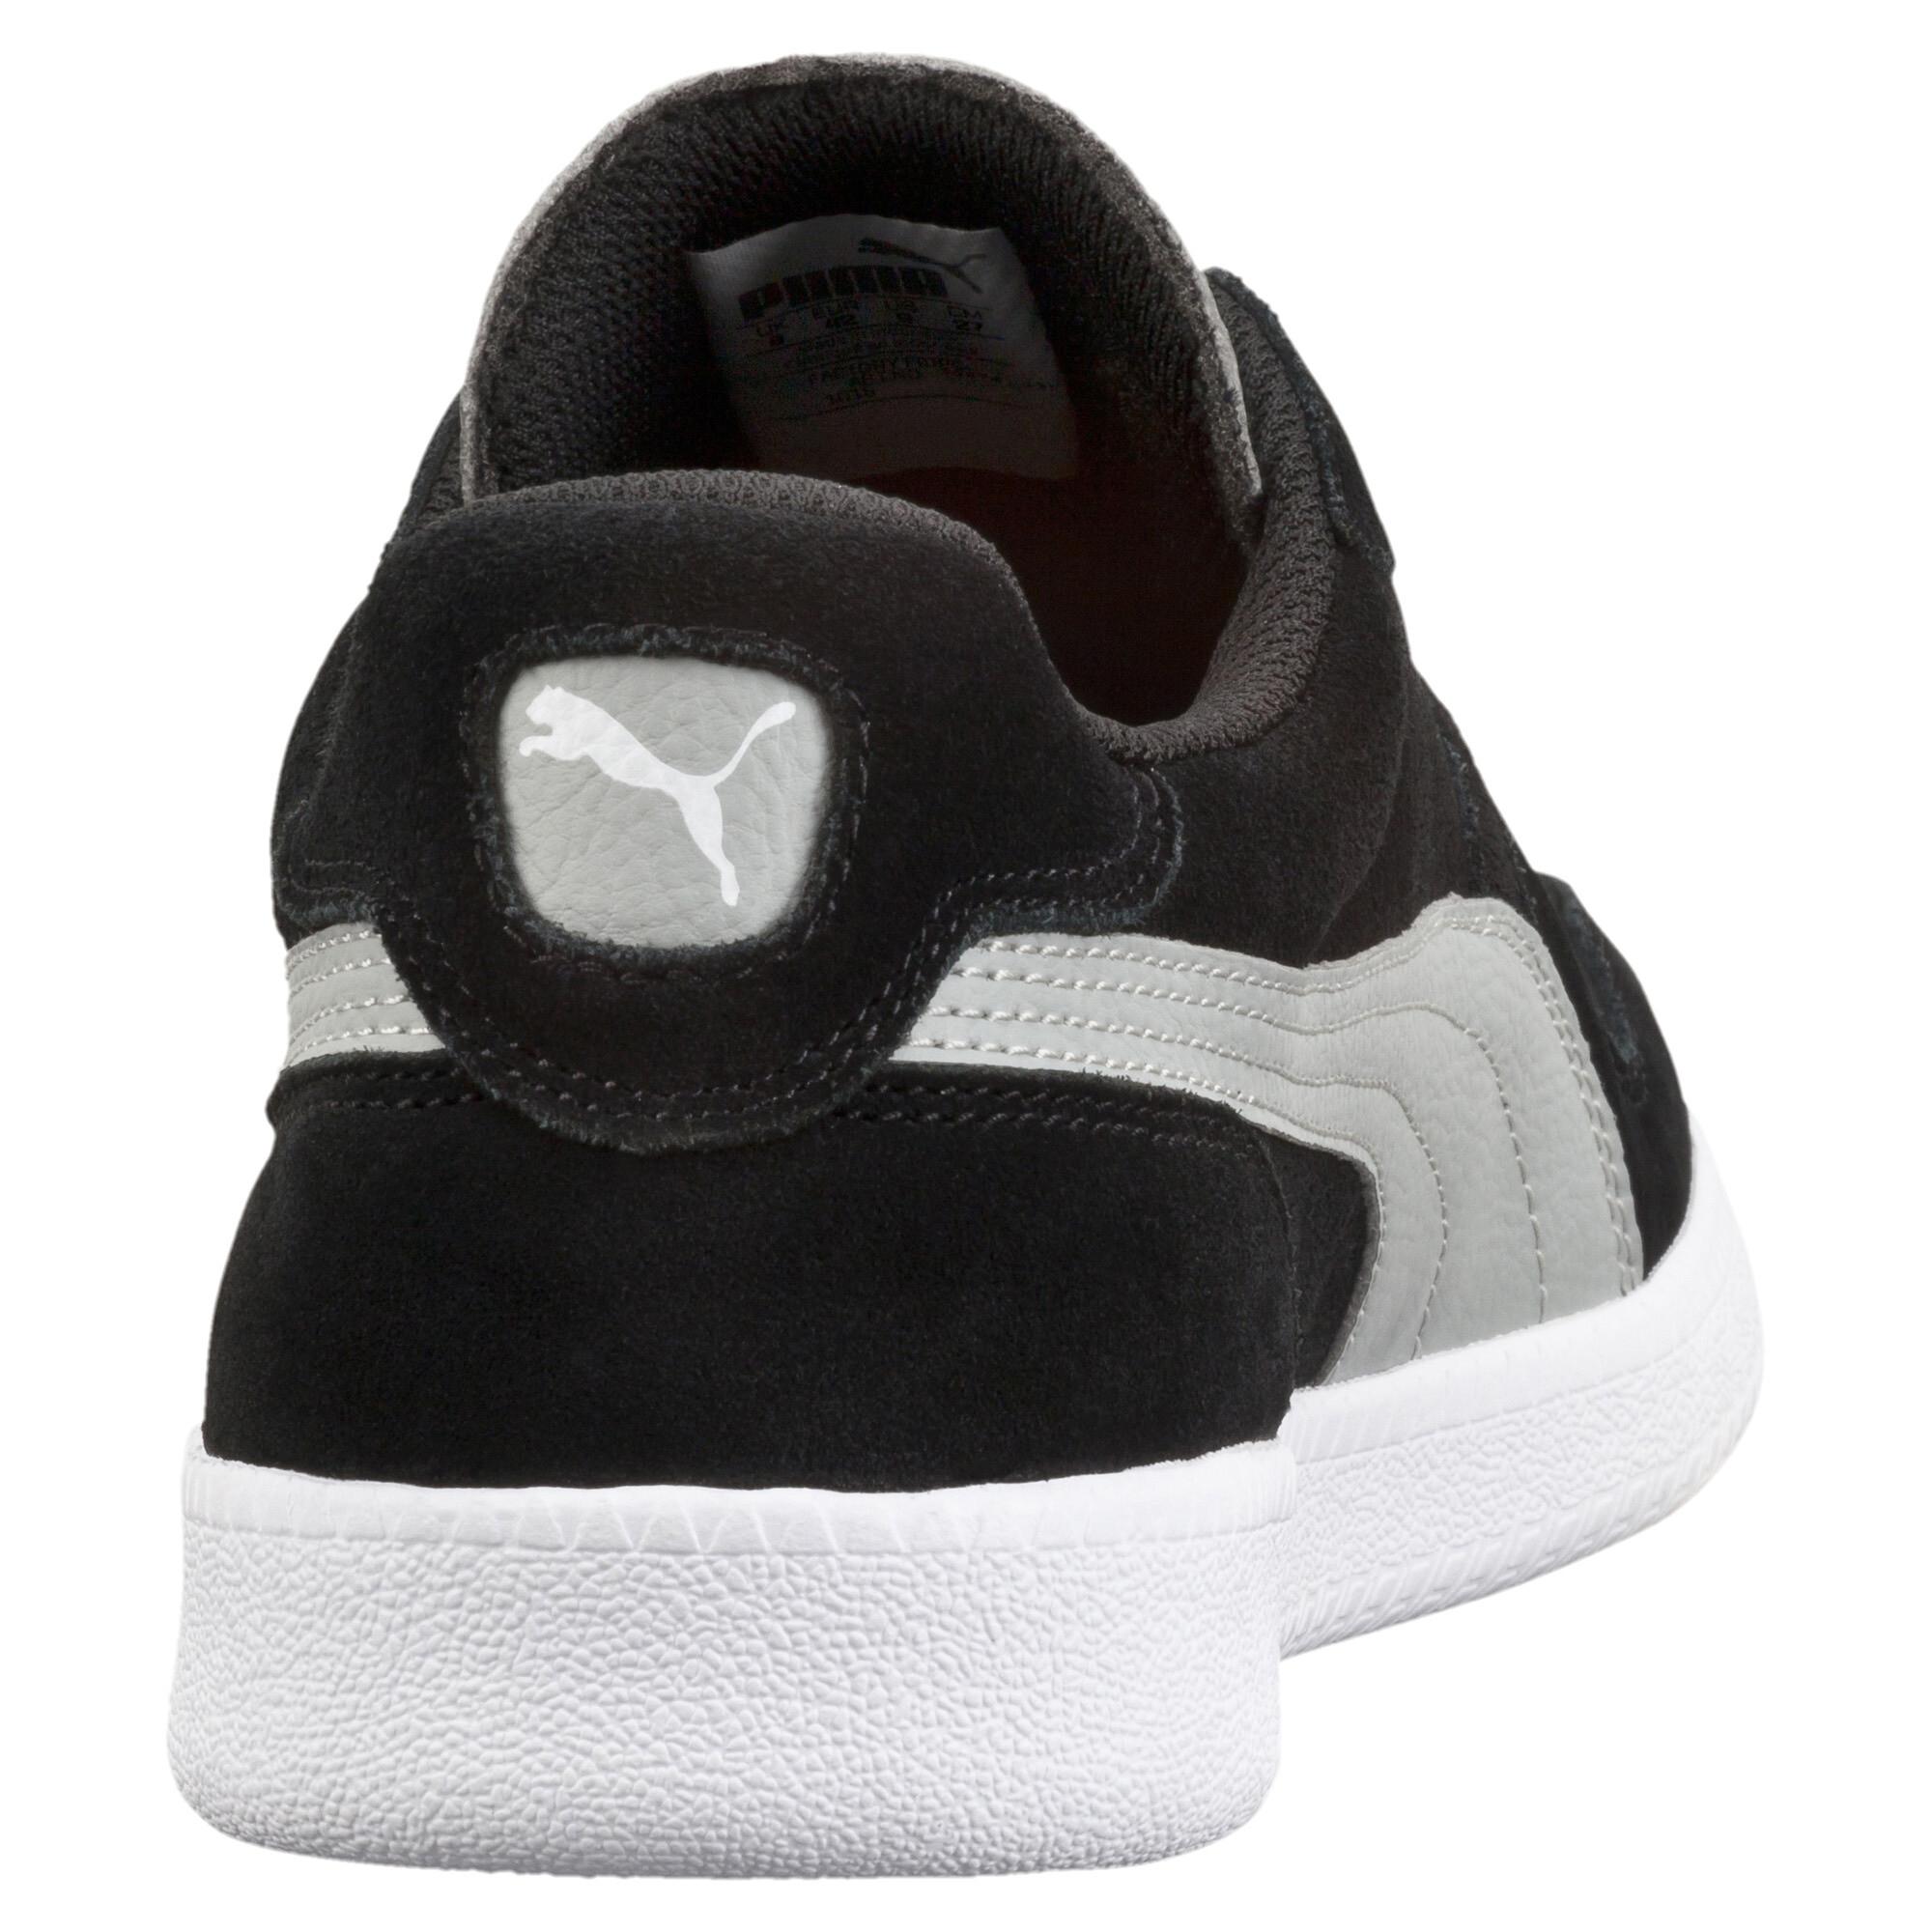 Image Puma Icra Suede Men's Sneakers #4